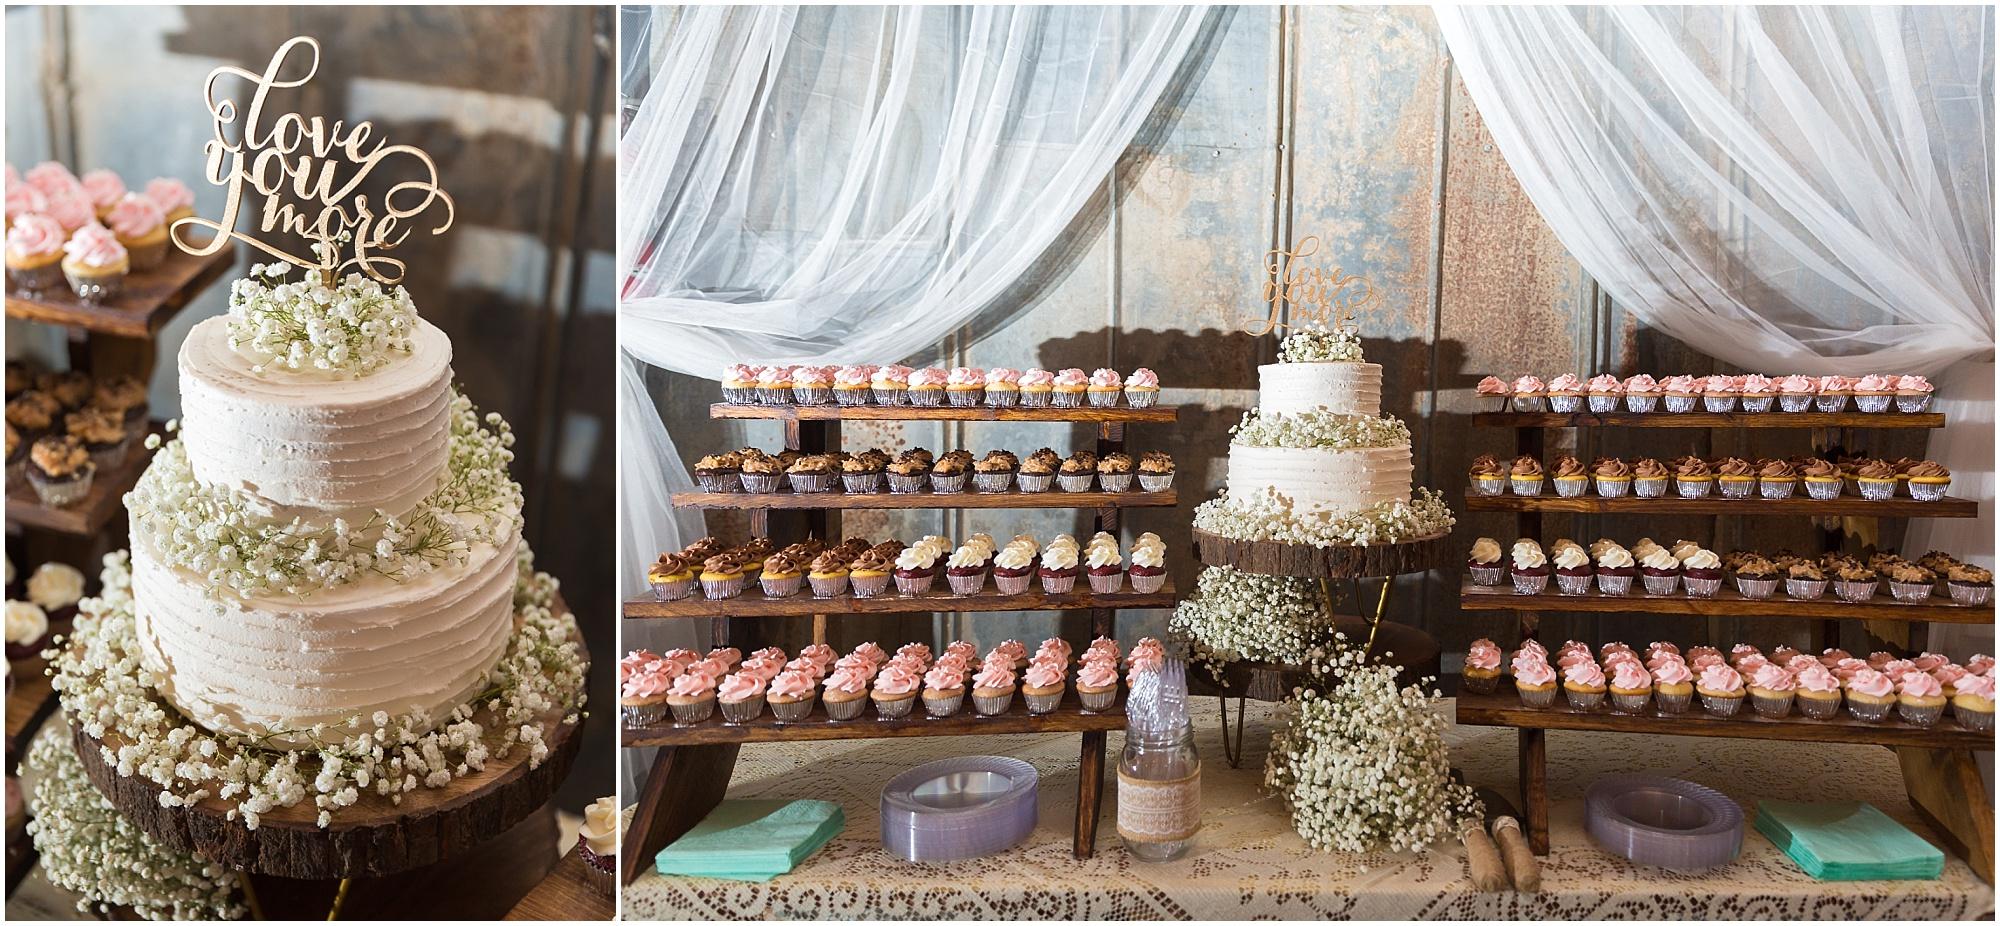 Cake and cupcake display at wedding reception - Jason & Melaina Photography